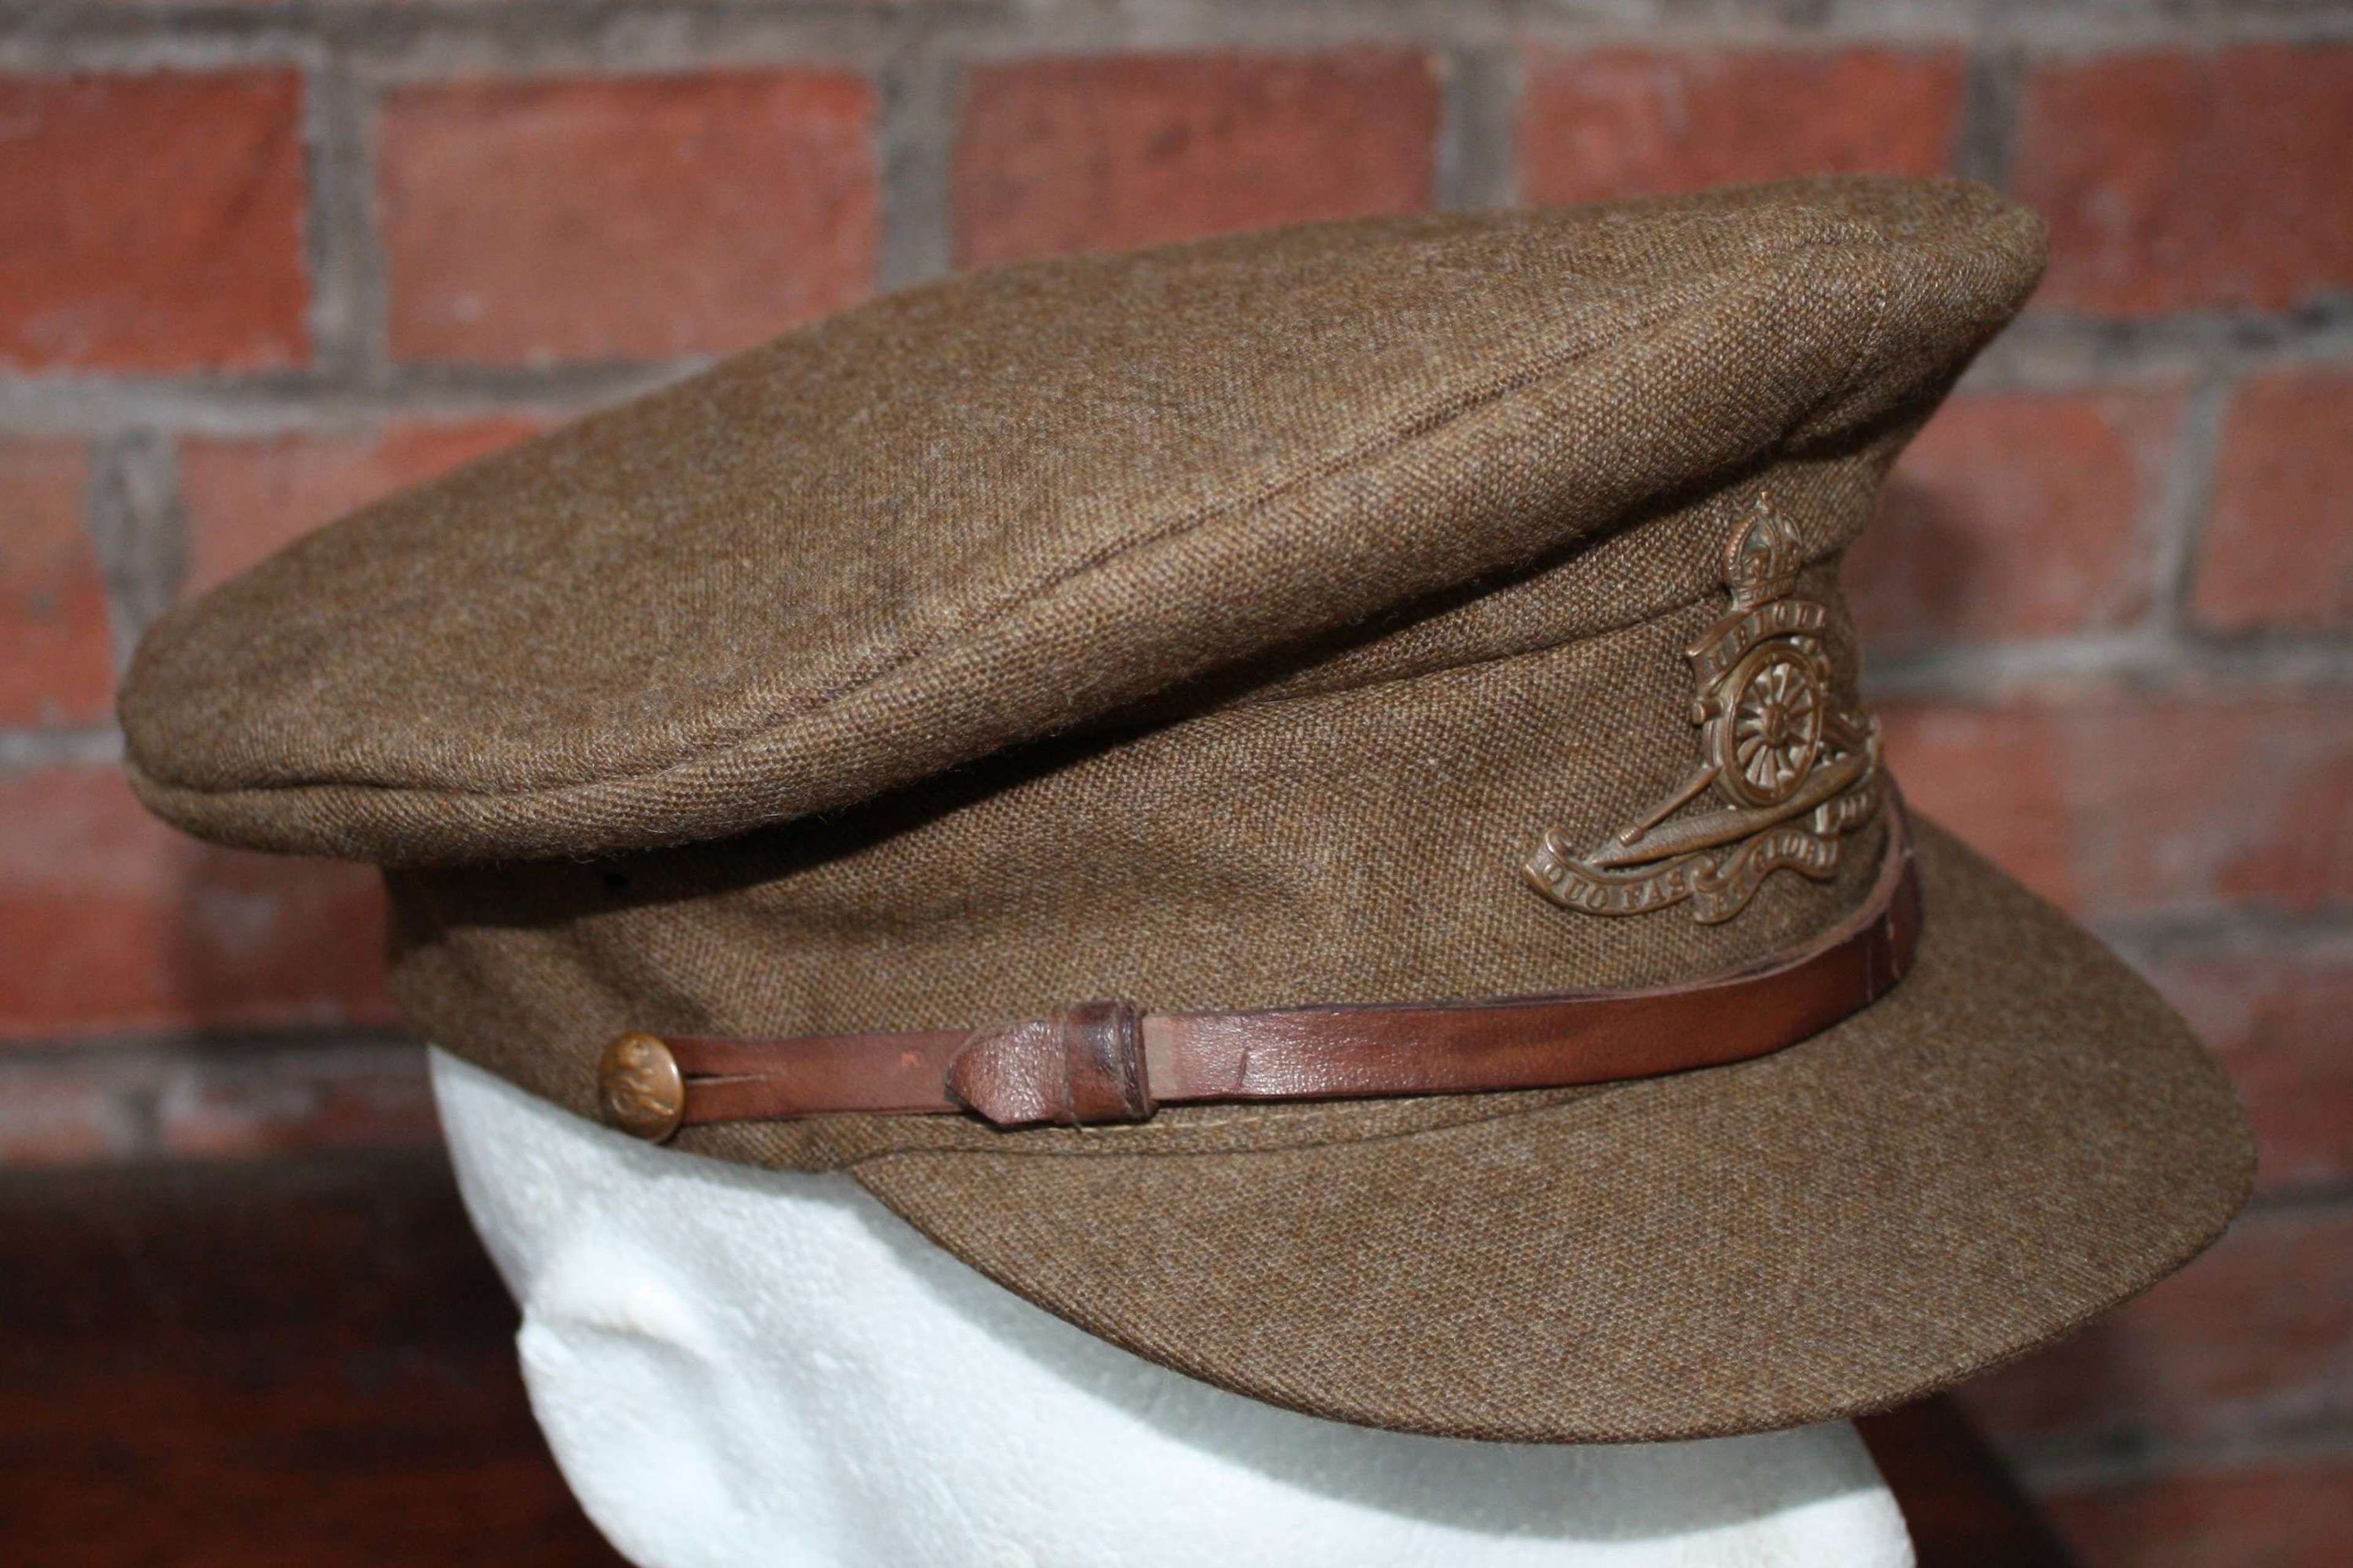 WW1 BRITISH OFFICERS FLOPPY STYLE KHAKI CAP ROYAL ARTILLERY